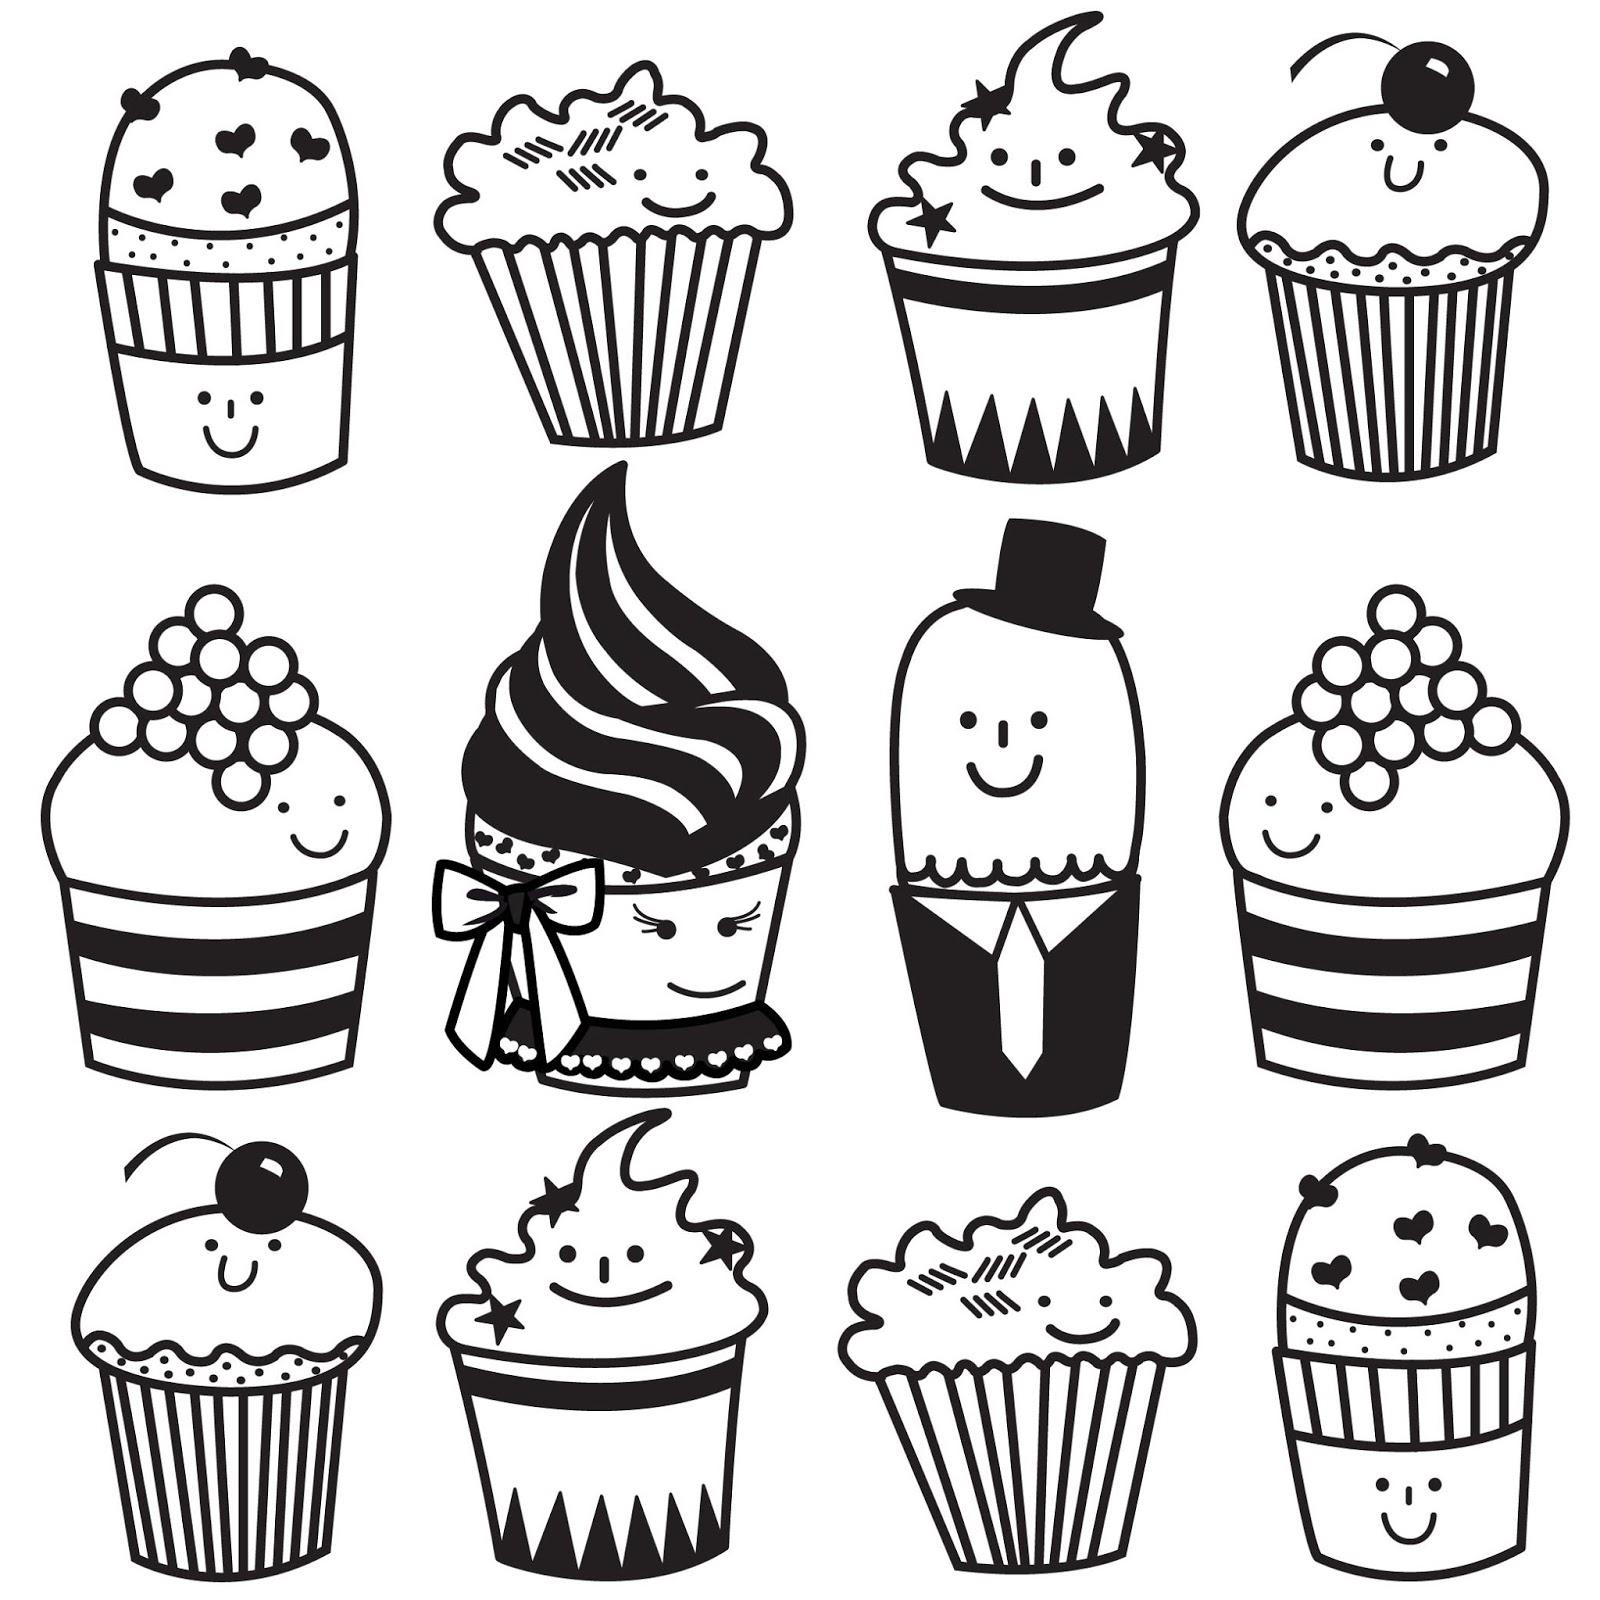 Free Cupcake Line Drawing Download Free Clip Art Free